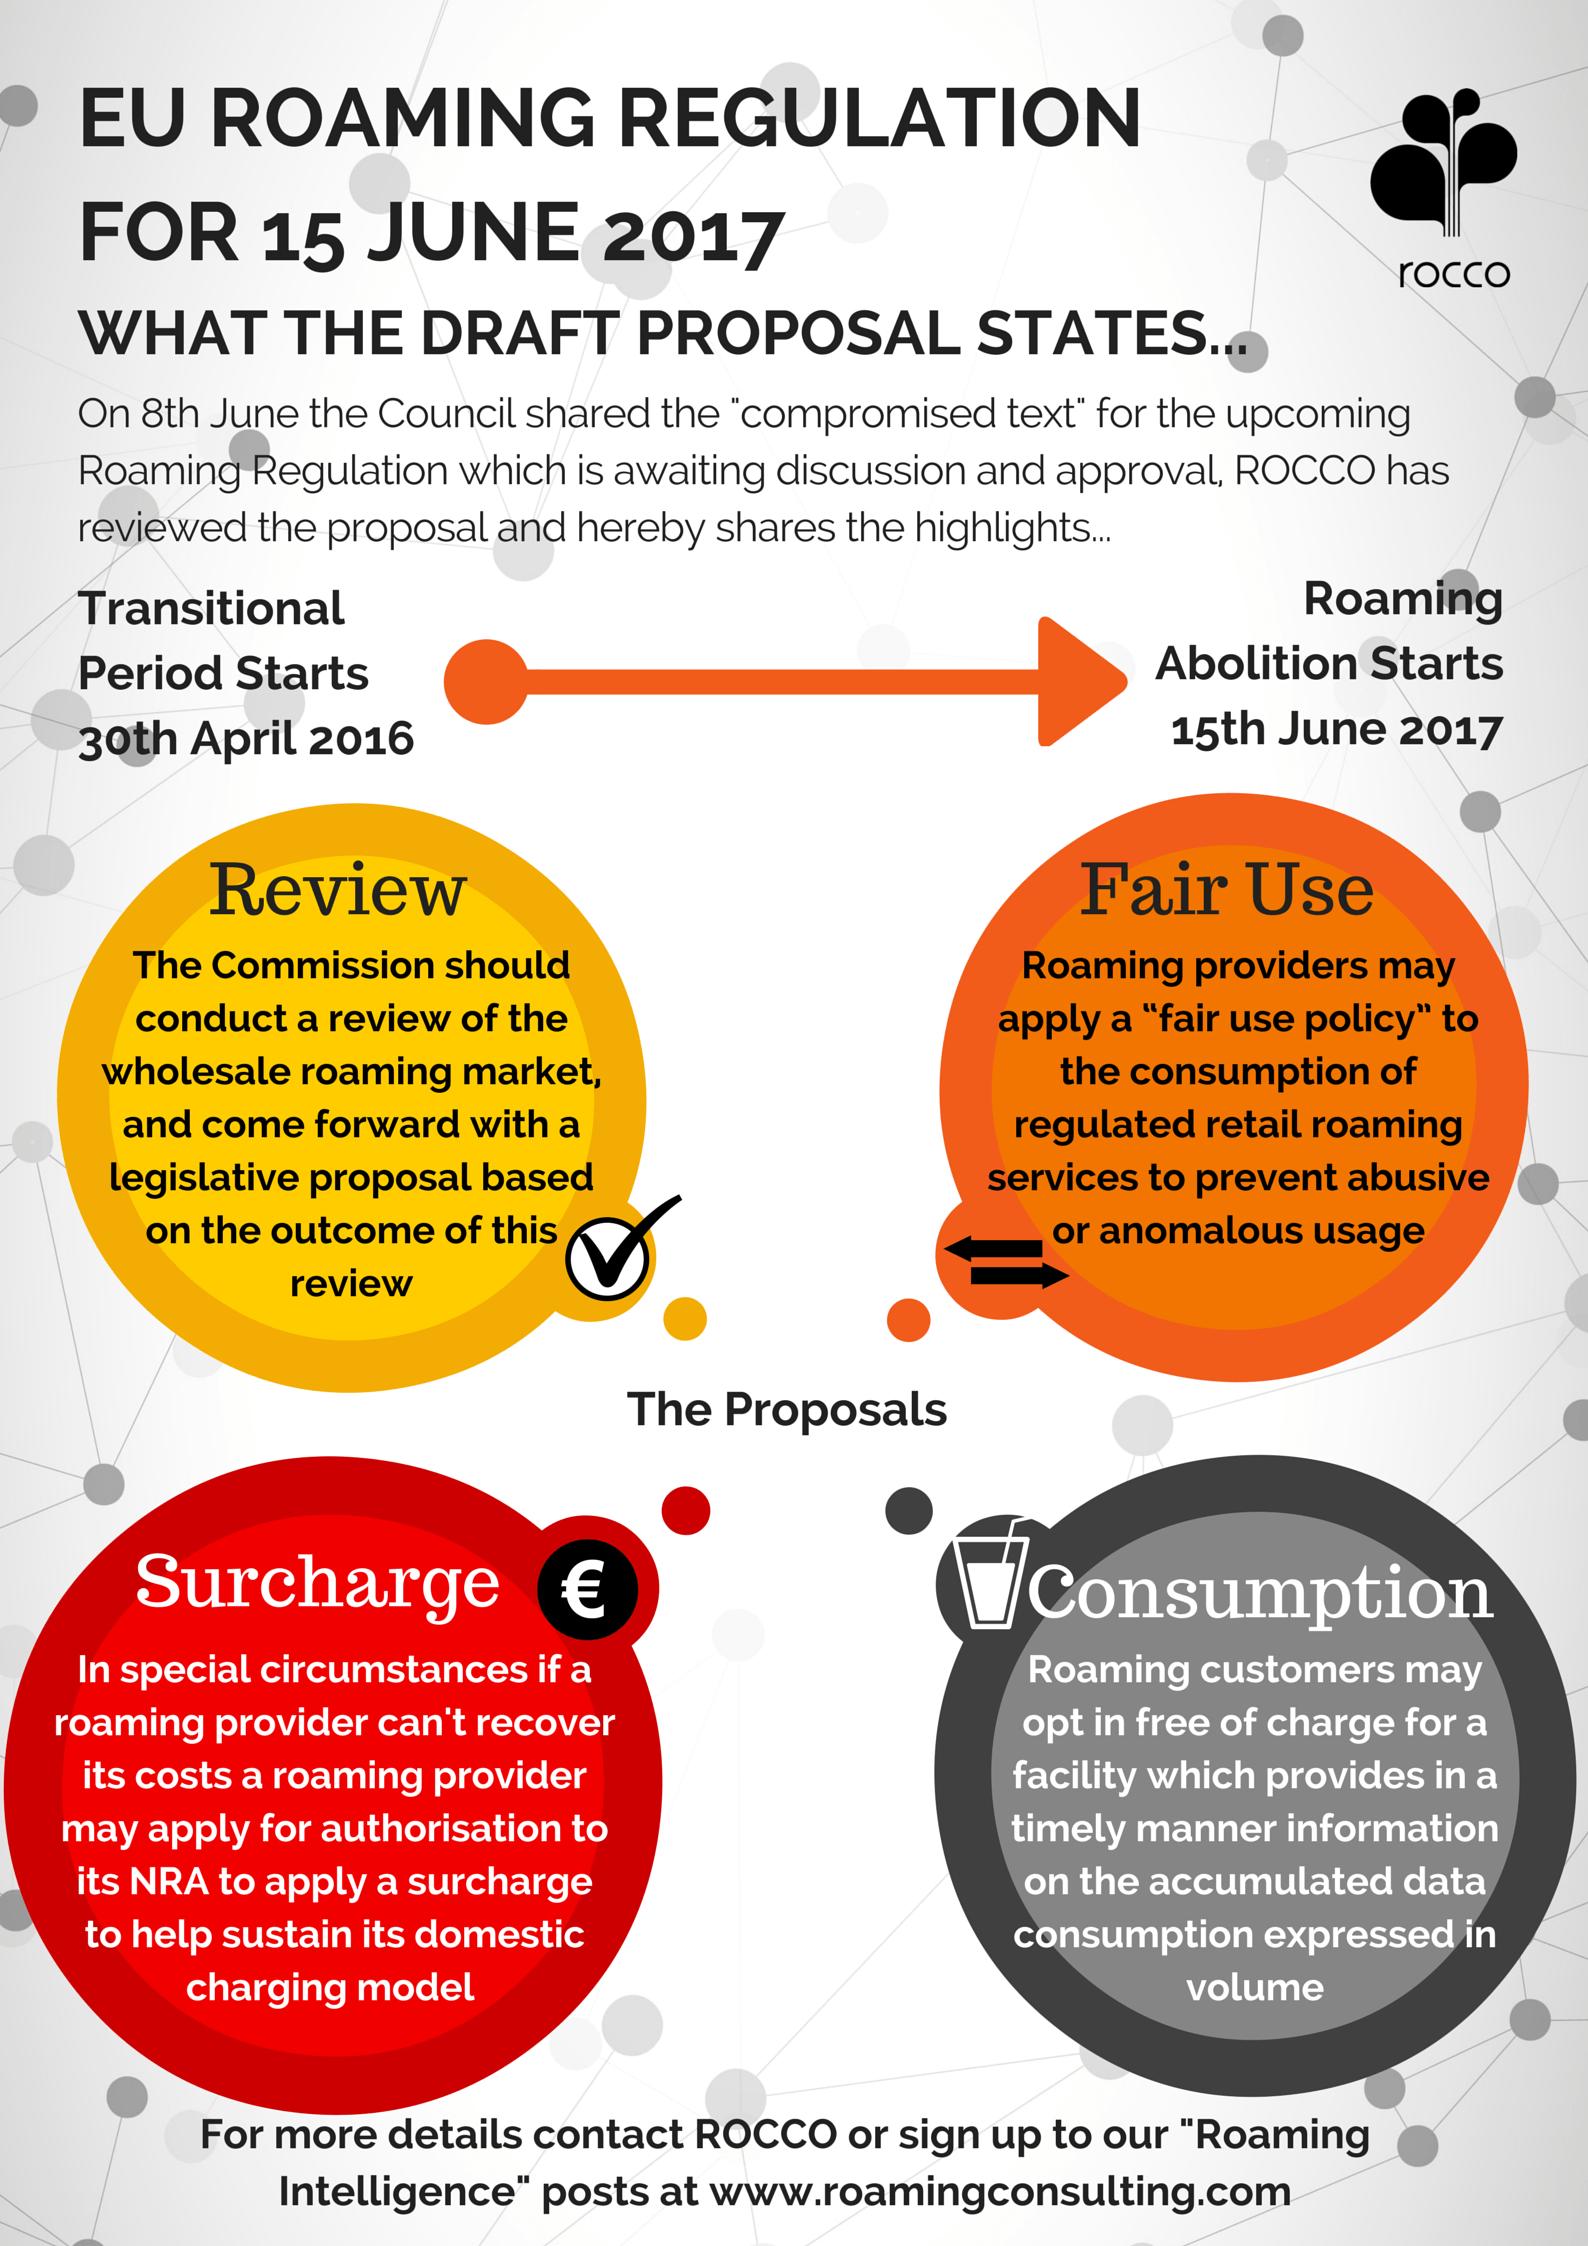 EU Roaming Regulation for 15th June 2017